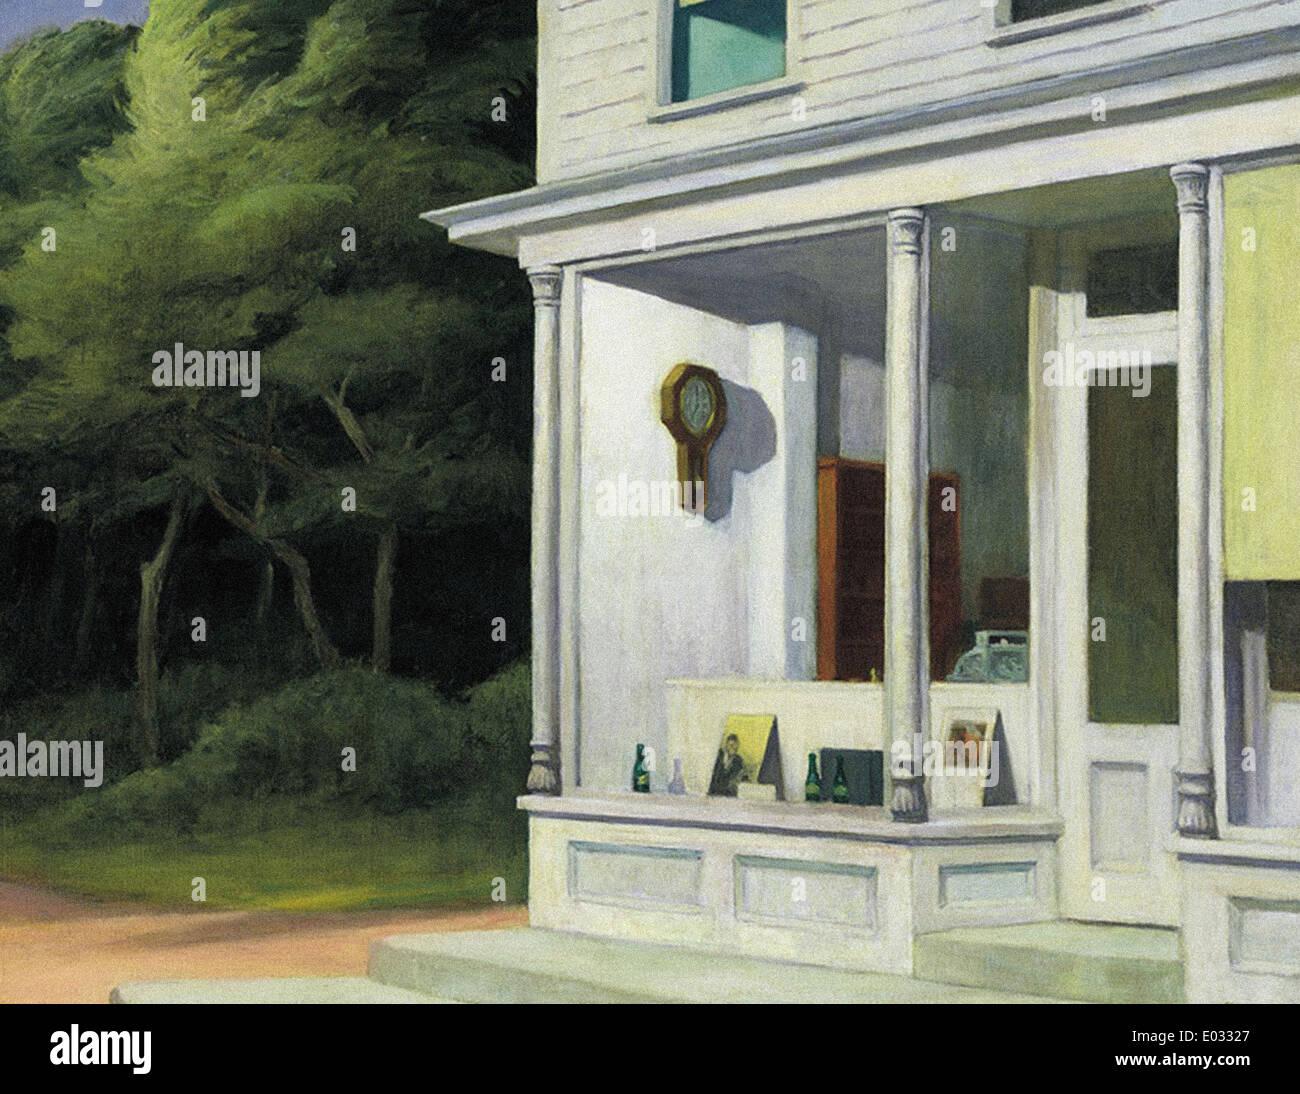 Edward Hopper Seven A.M. - Stock Image